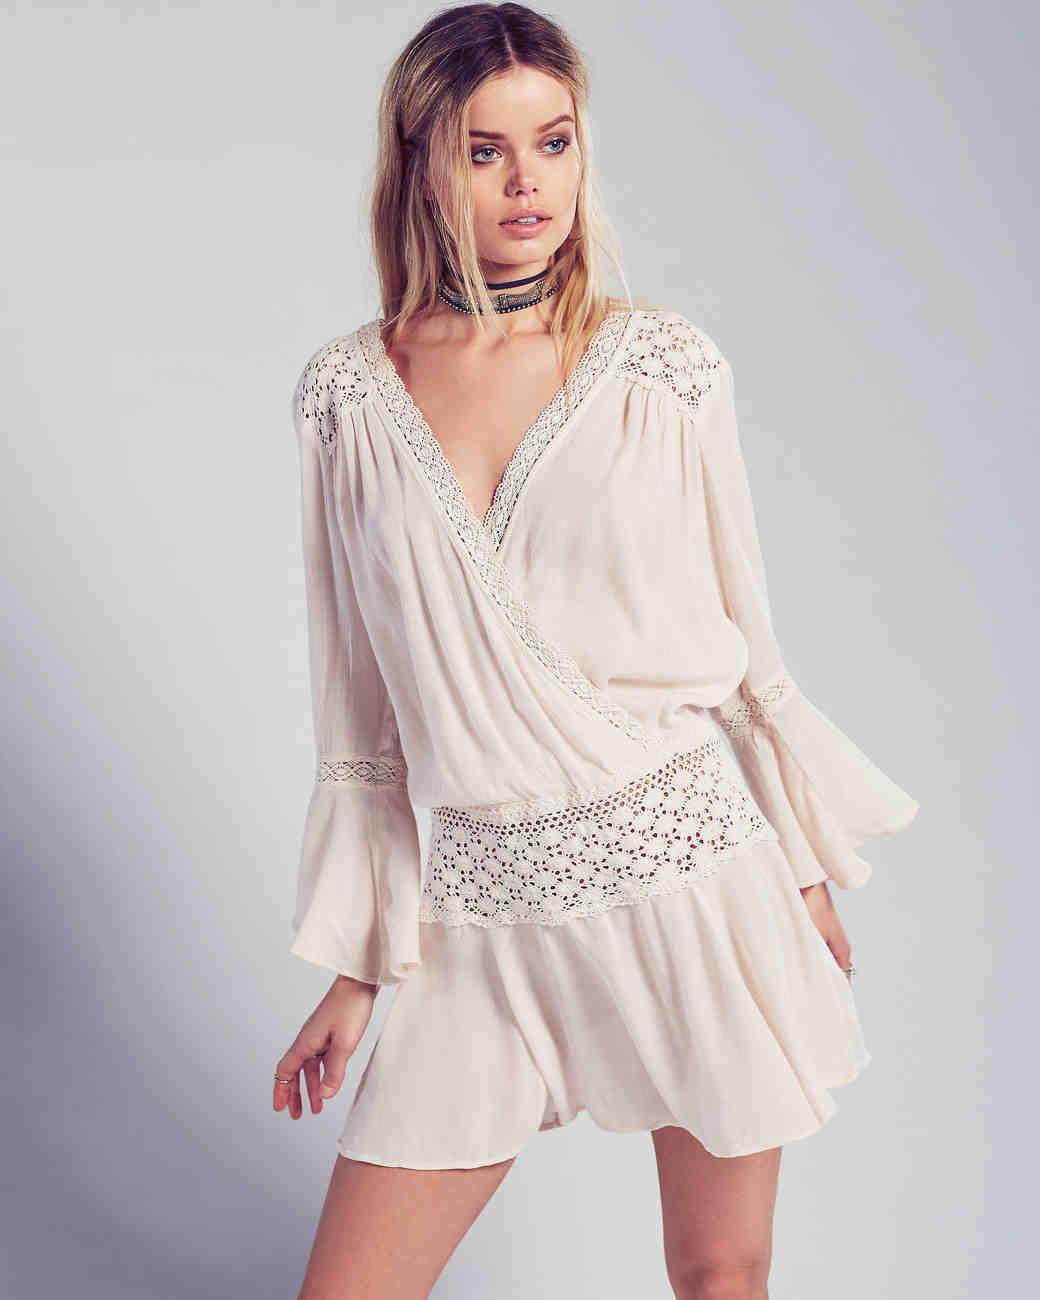 bachelorette-party-dress-free-people-bella-mini-0416.jpg